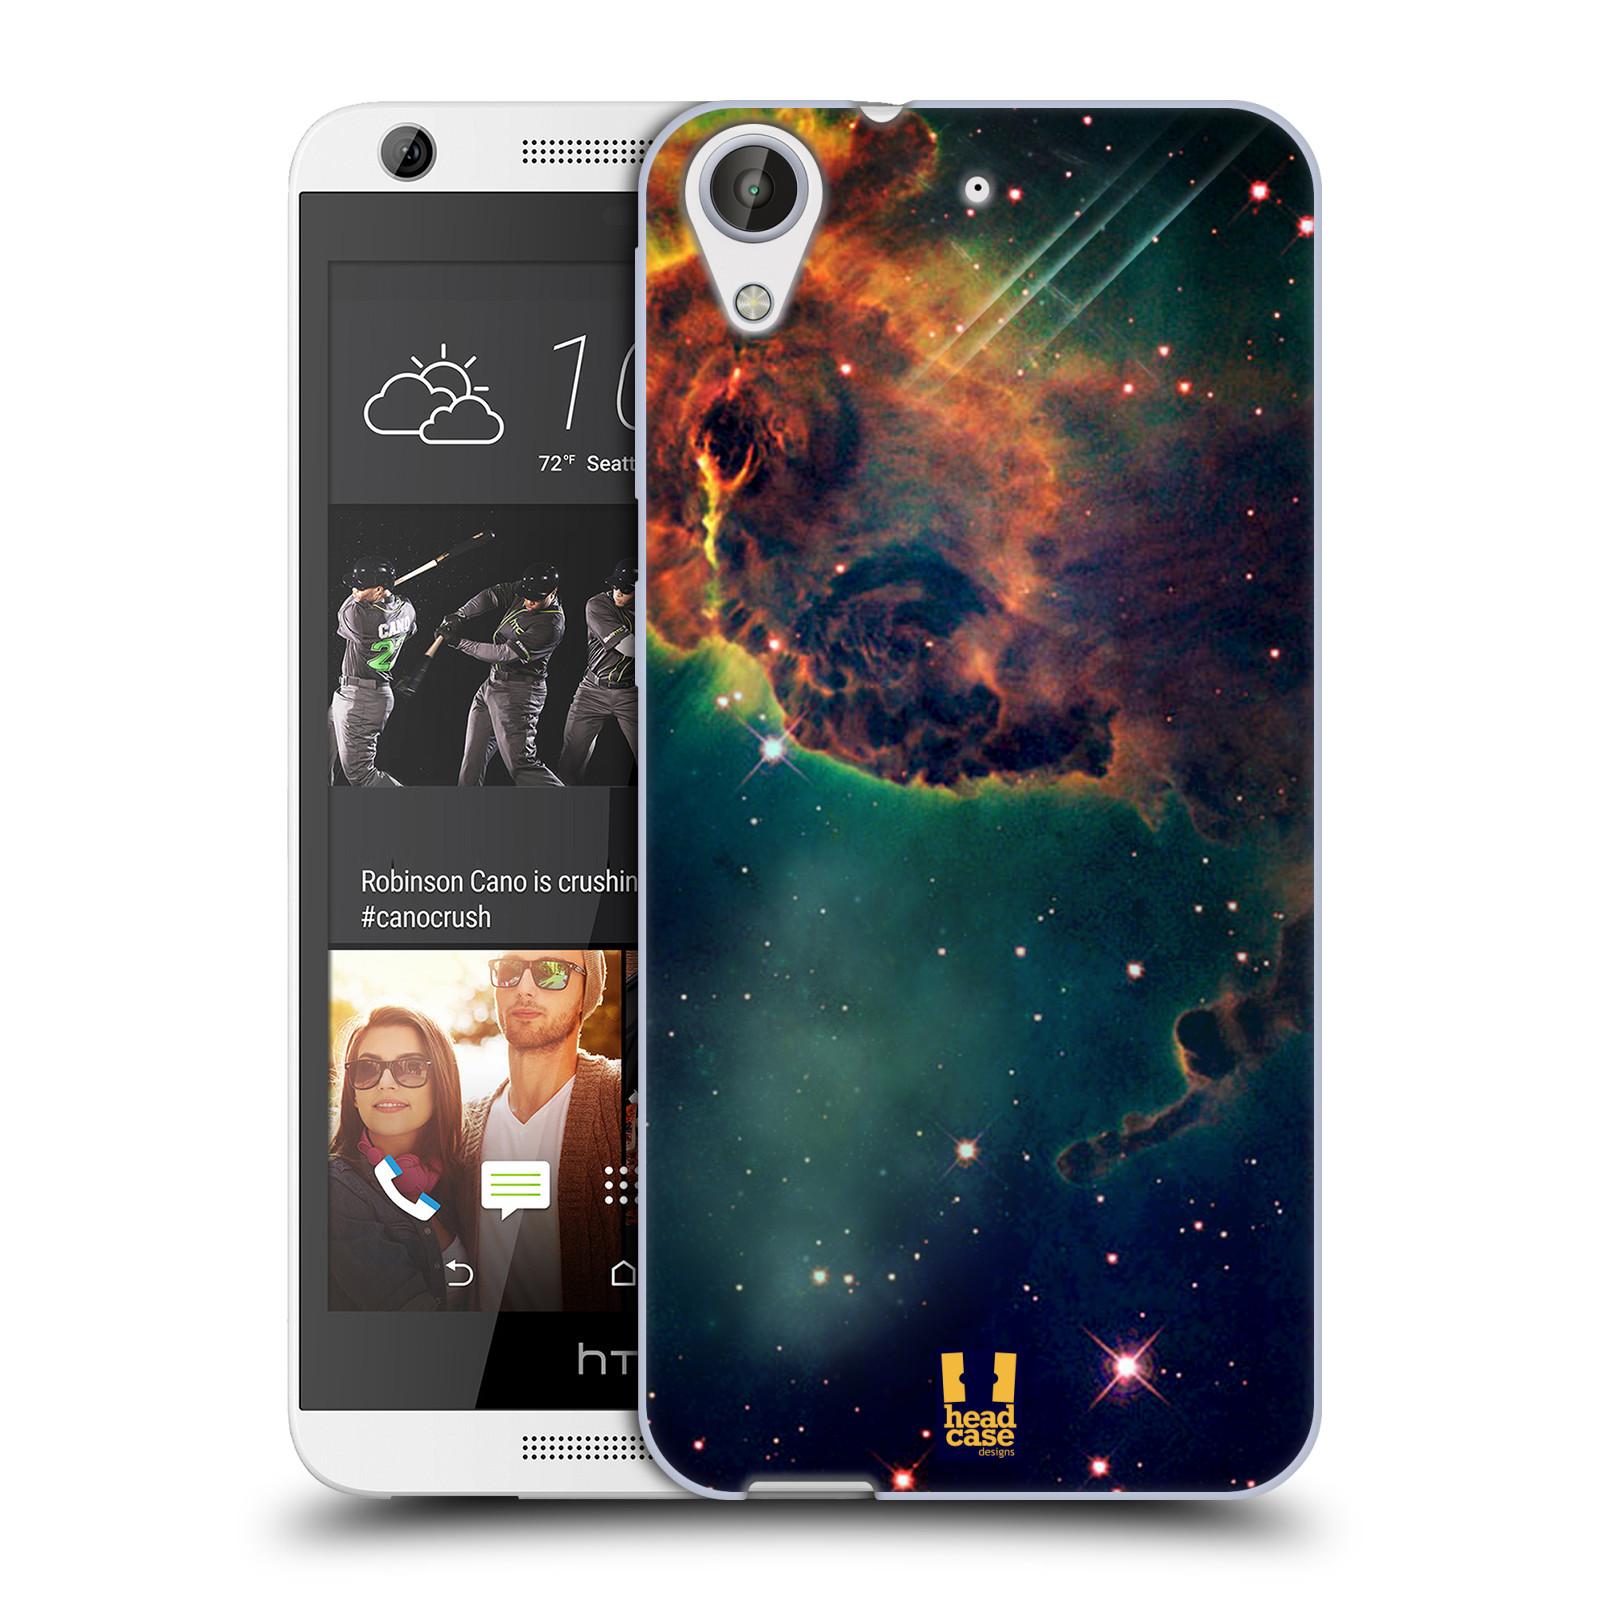 HEAD CASE silikonový obal na mobil HTC Desire 626 / HTC Desire 626G vzor Vesmírná krása MLHOVINA